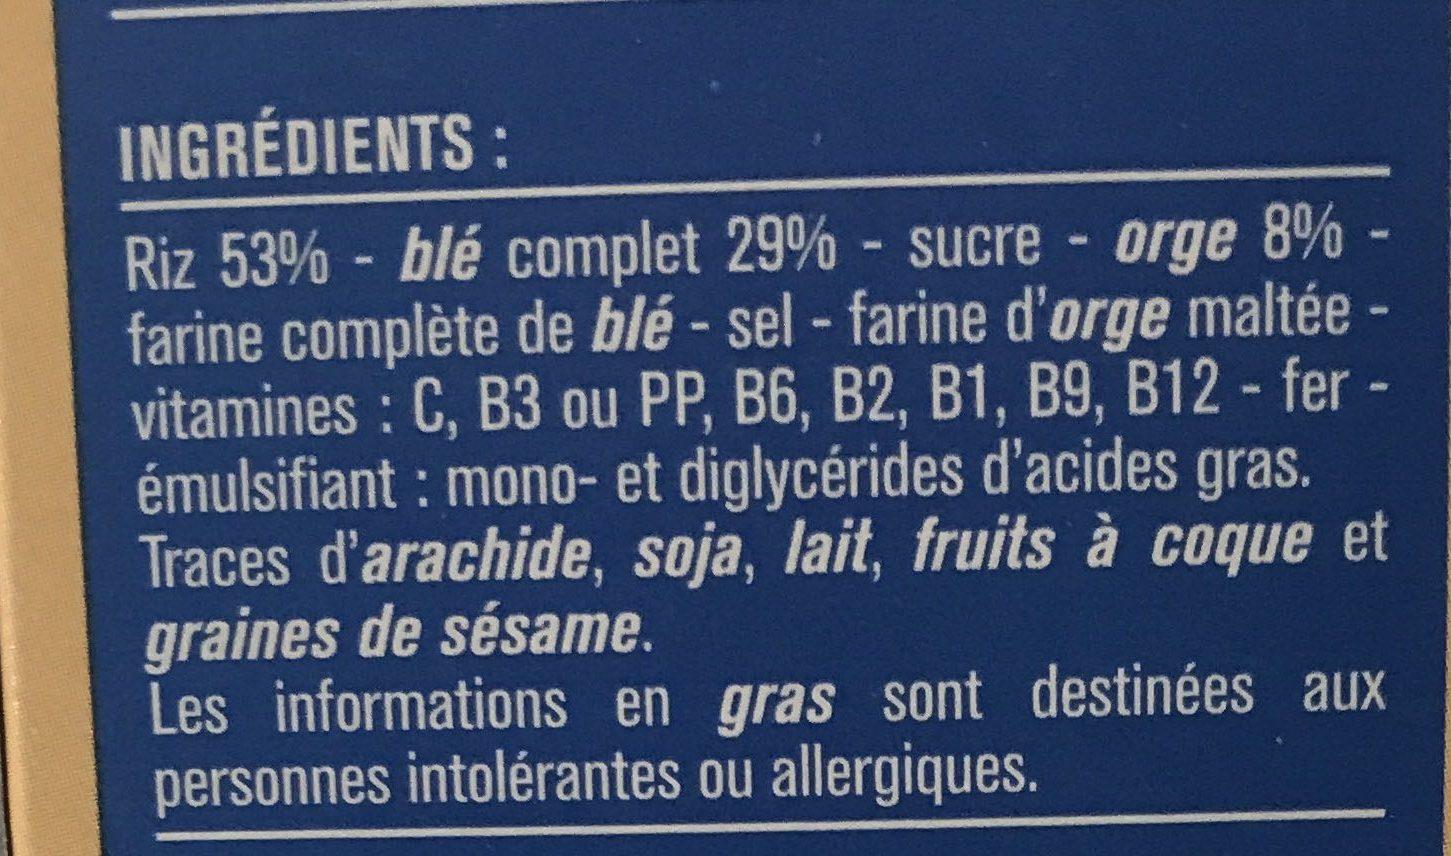 Pétales Riz blé complet & orge - Ingredienti - fr